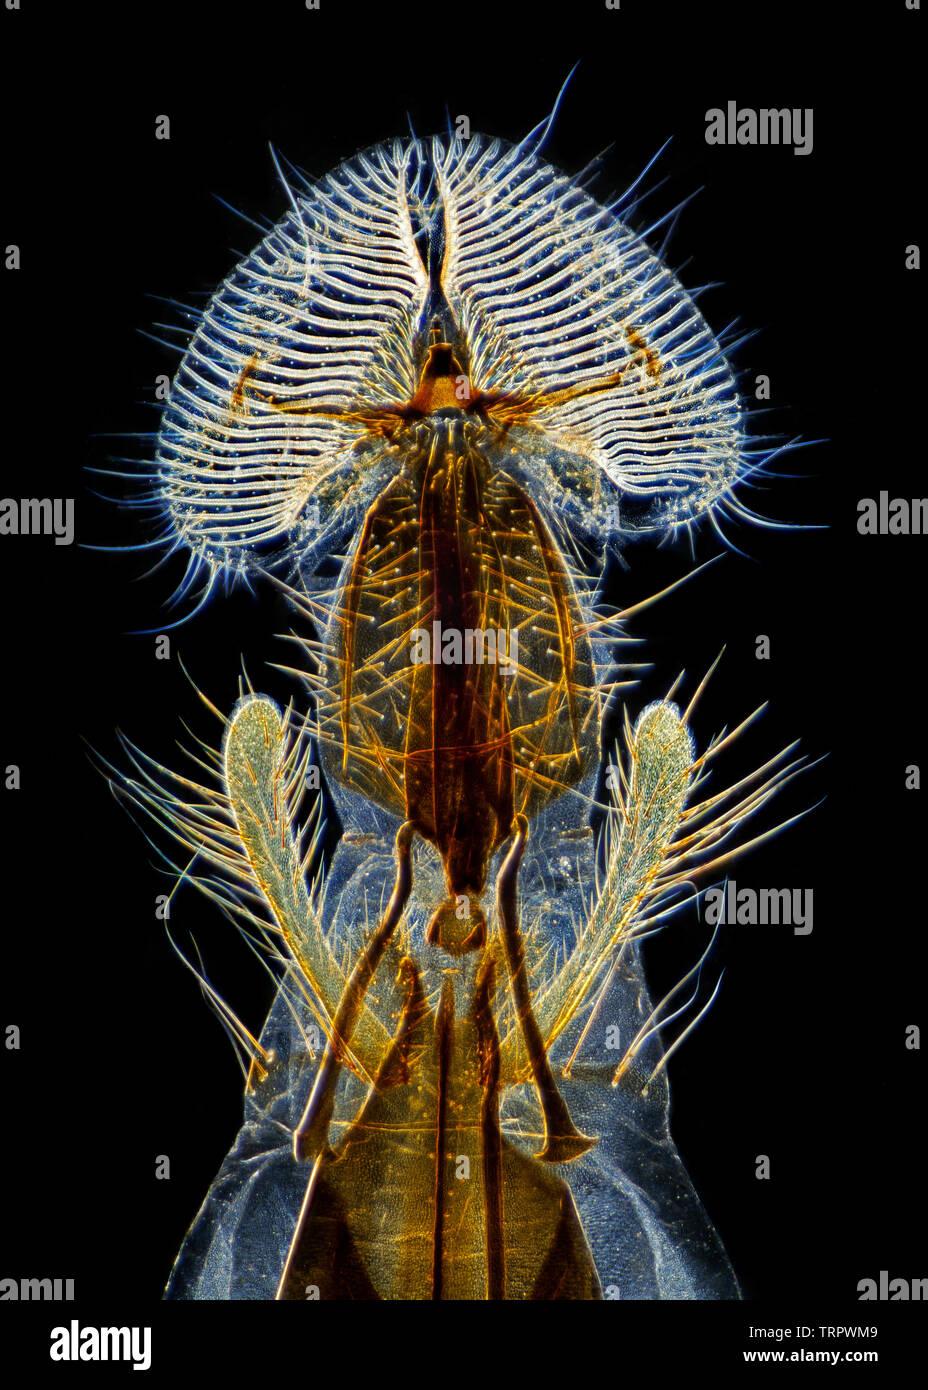 A blowfly mouthparts, (proboscis) a classic microscopy preparation. darkfield photomicrograph. - Stock Image